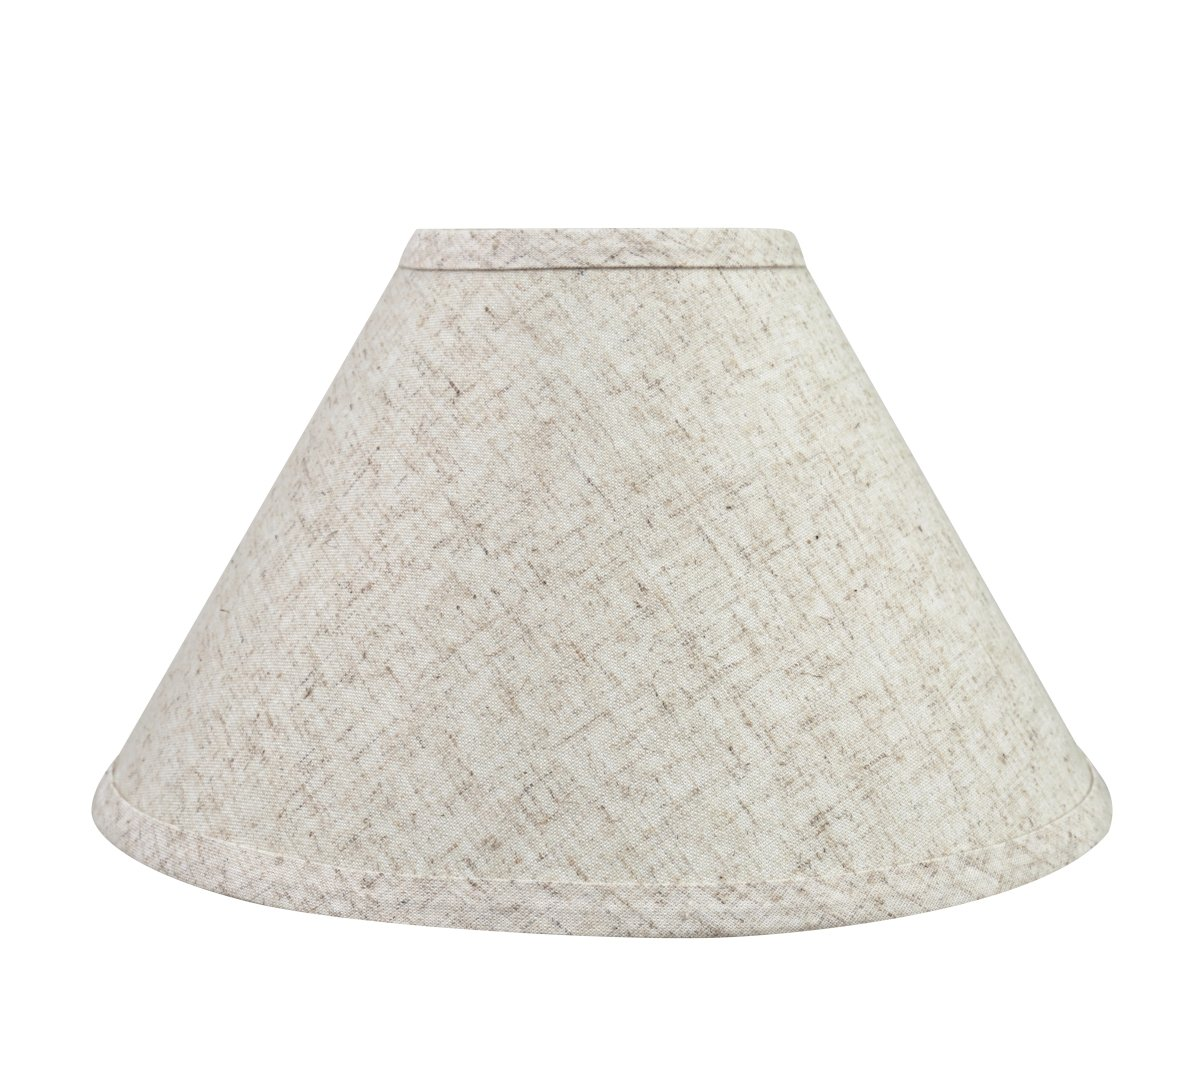 Aspen Creative 58703 Transitional Hardback Empire Shape UNO Construction Lamp Shade in Beige, 11'' Wide (4'' x 11'' x 7'')